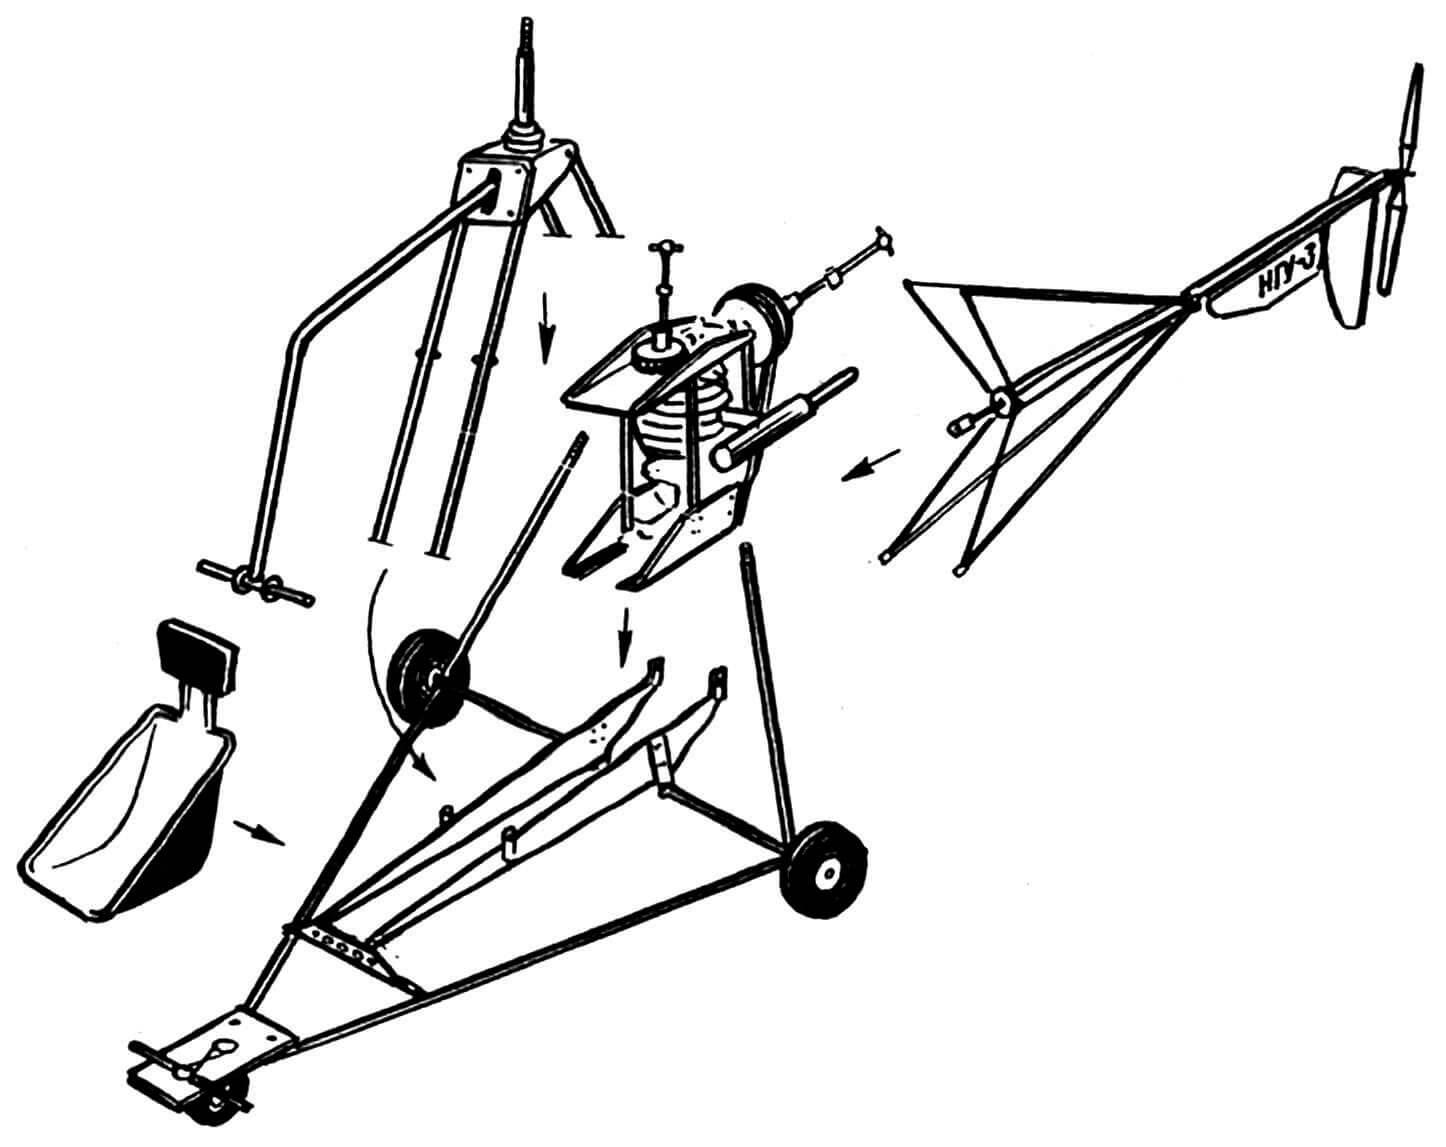 Рис. 3. Компоновка силового каркаса и силового агрегата.